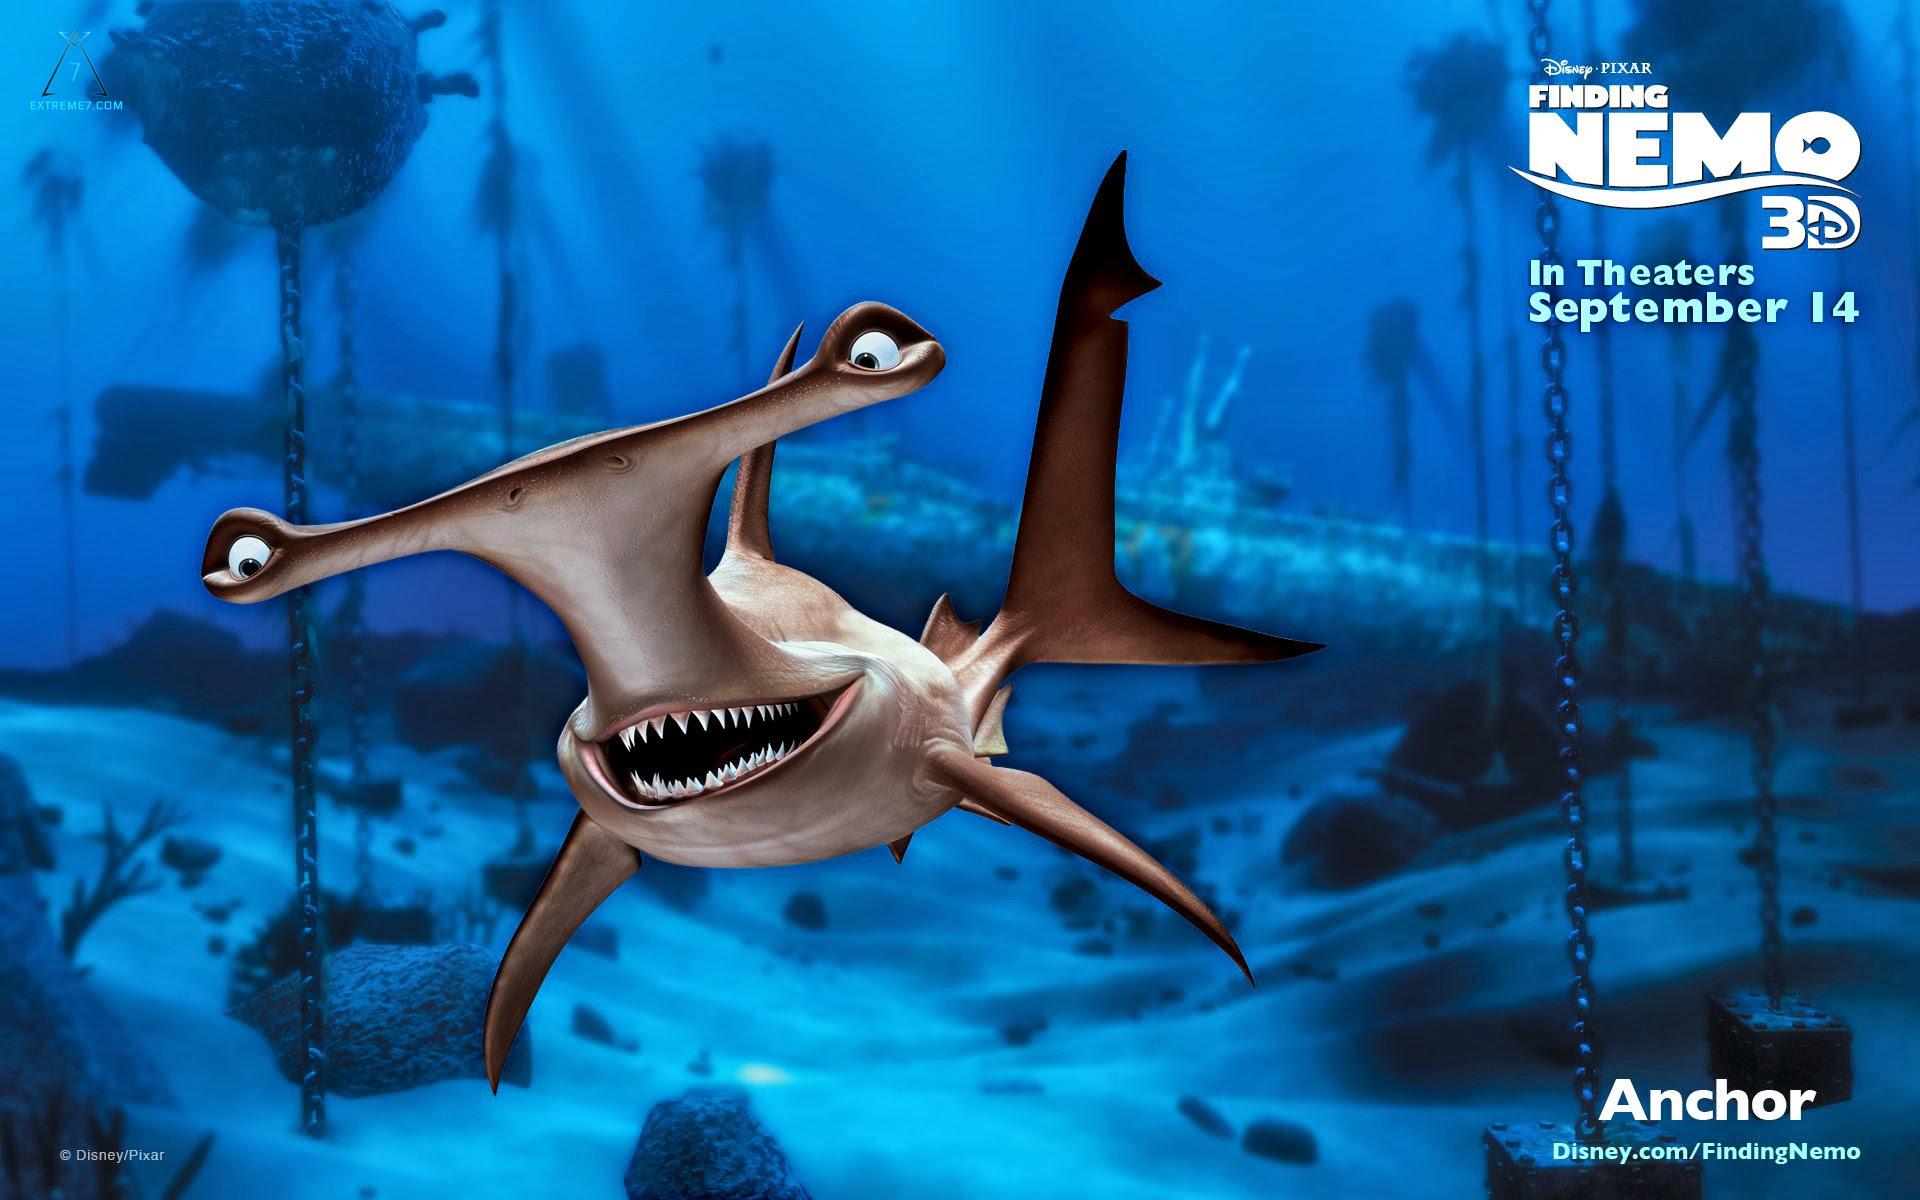 Finding Nemo D Animasi Hd Wallpaper: Finding Nemo 3D Official Wallpapers